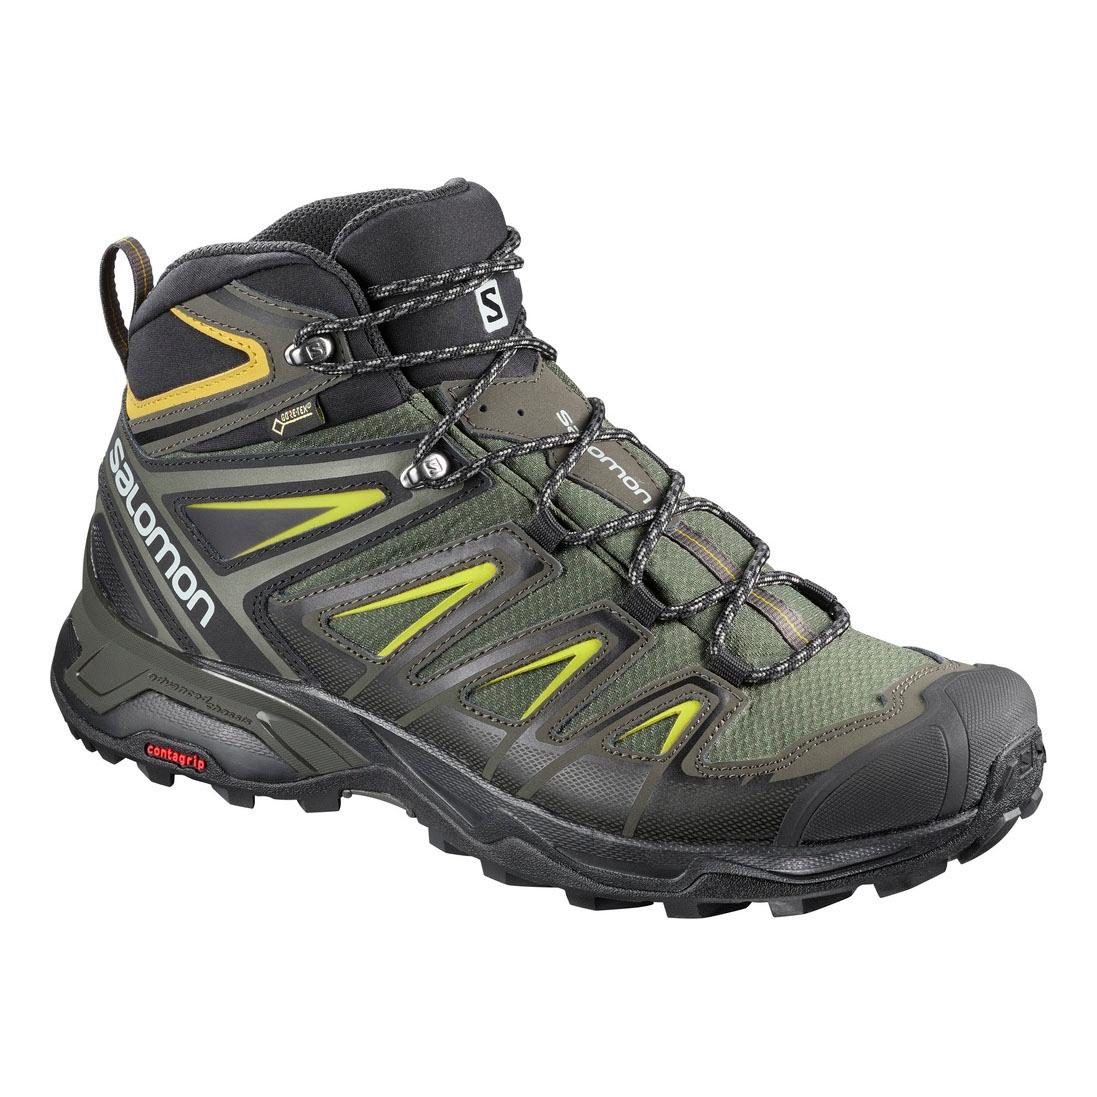 size 40 be9f4 2ea19 Salomon X Ultra 3 MID GTX Walking Boots (Men's) - Castor Grey/Black/Green  Sulphur